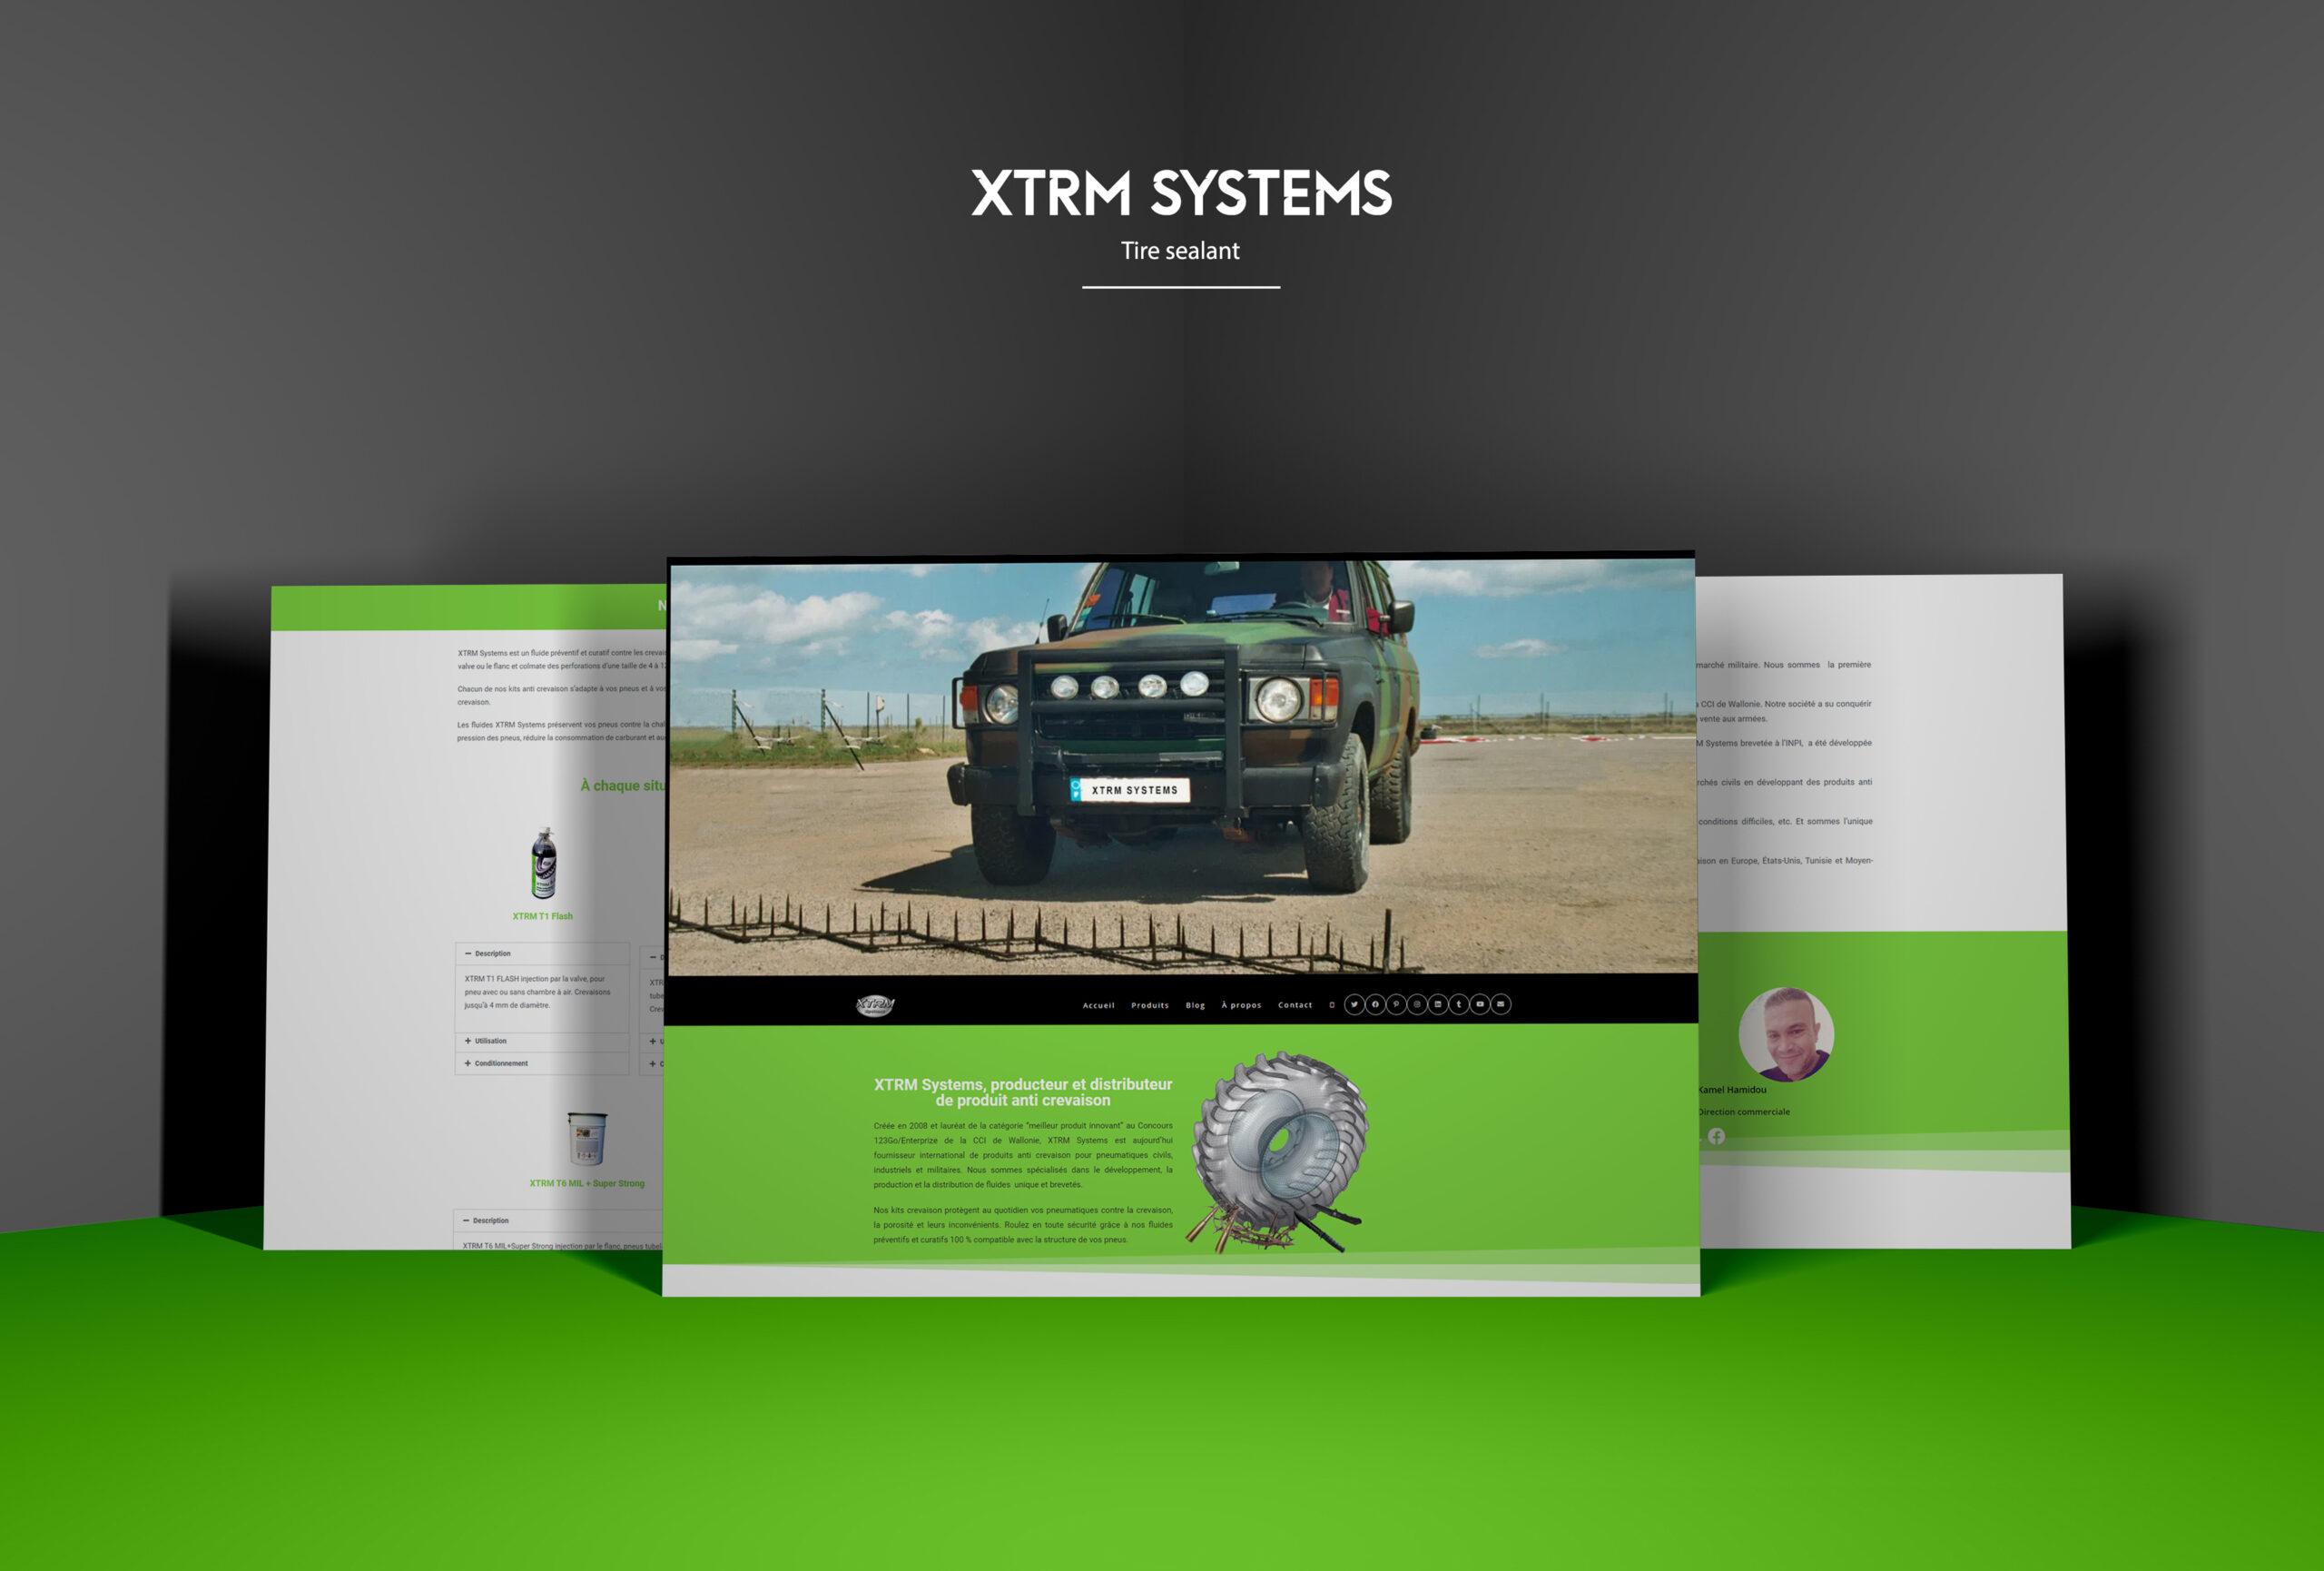 création site web wordpress xtrm systems